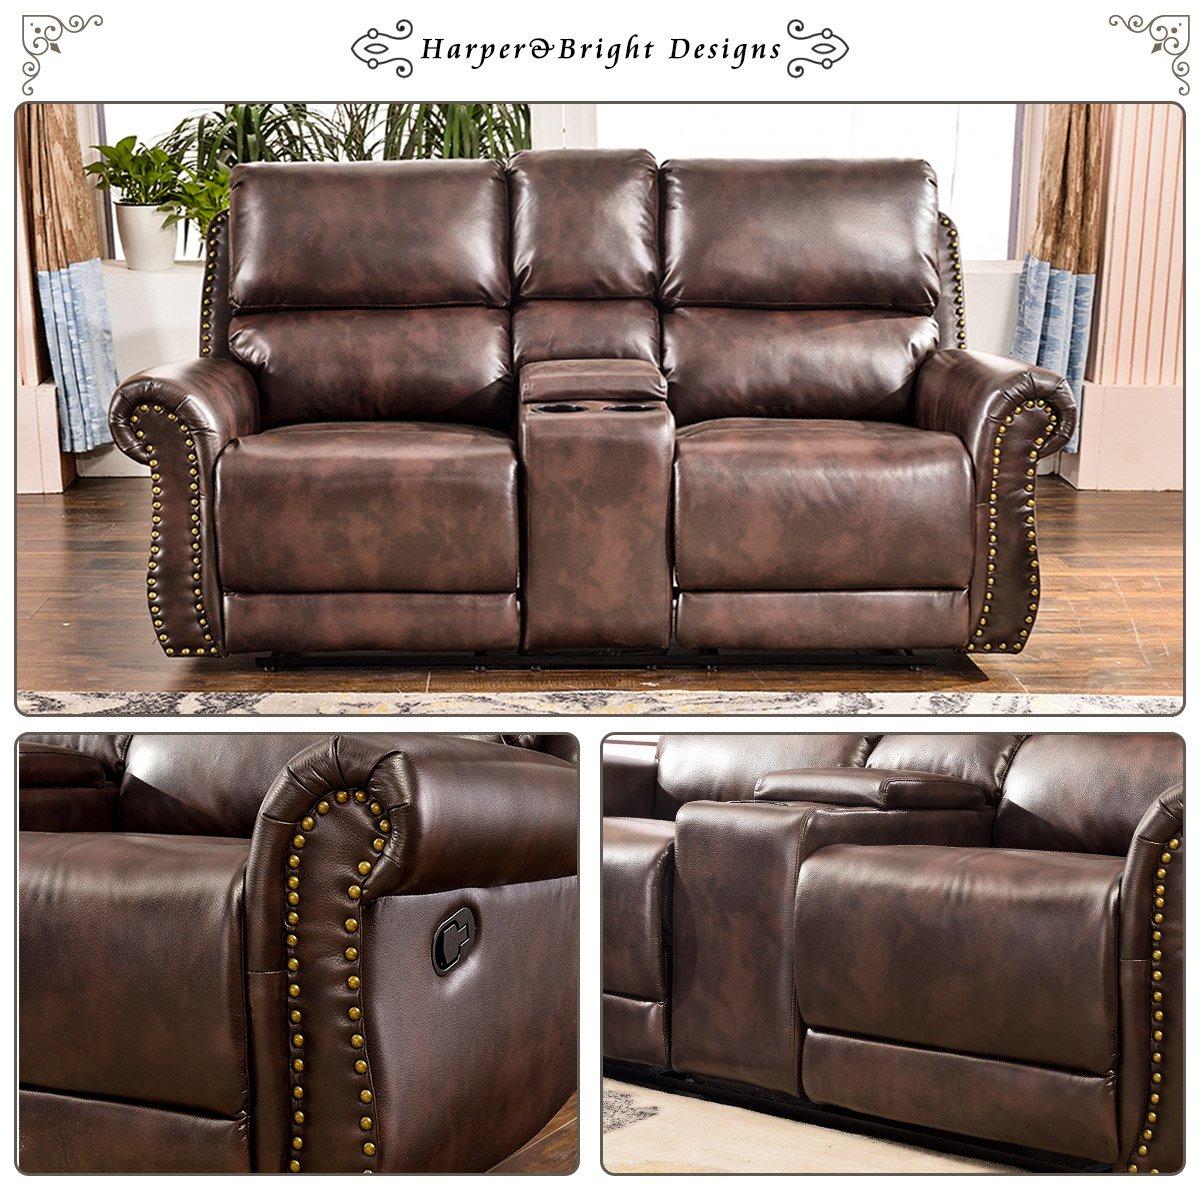 Harper & Bright Designs Sectional Recliner Sofa Set (Brown) (Loveseat)